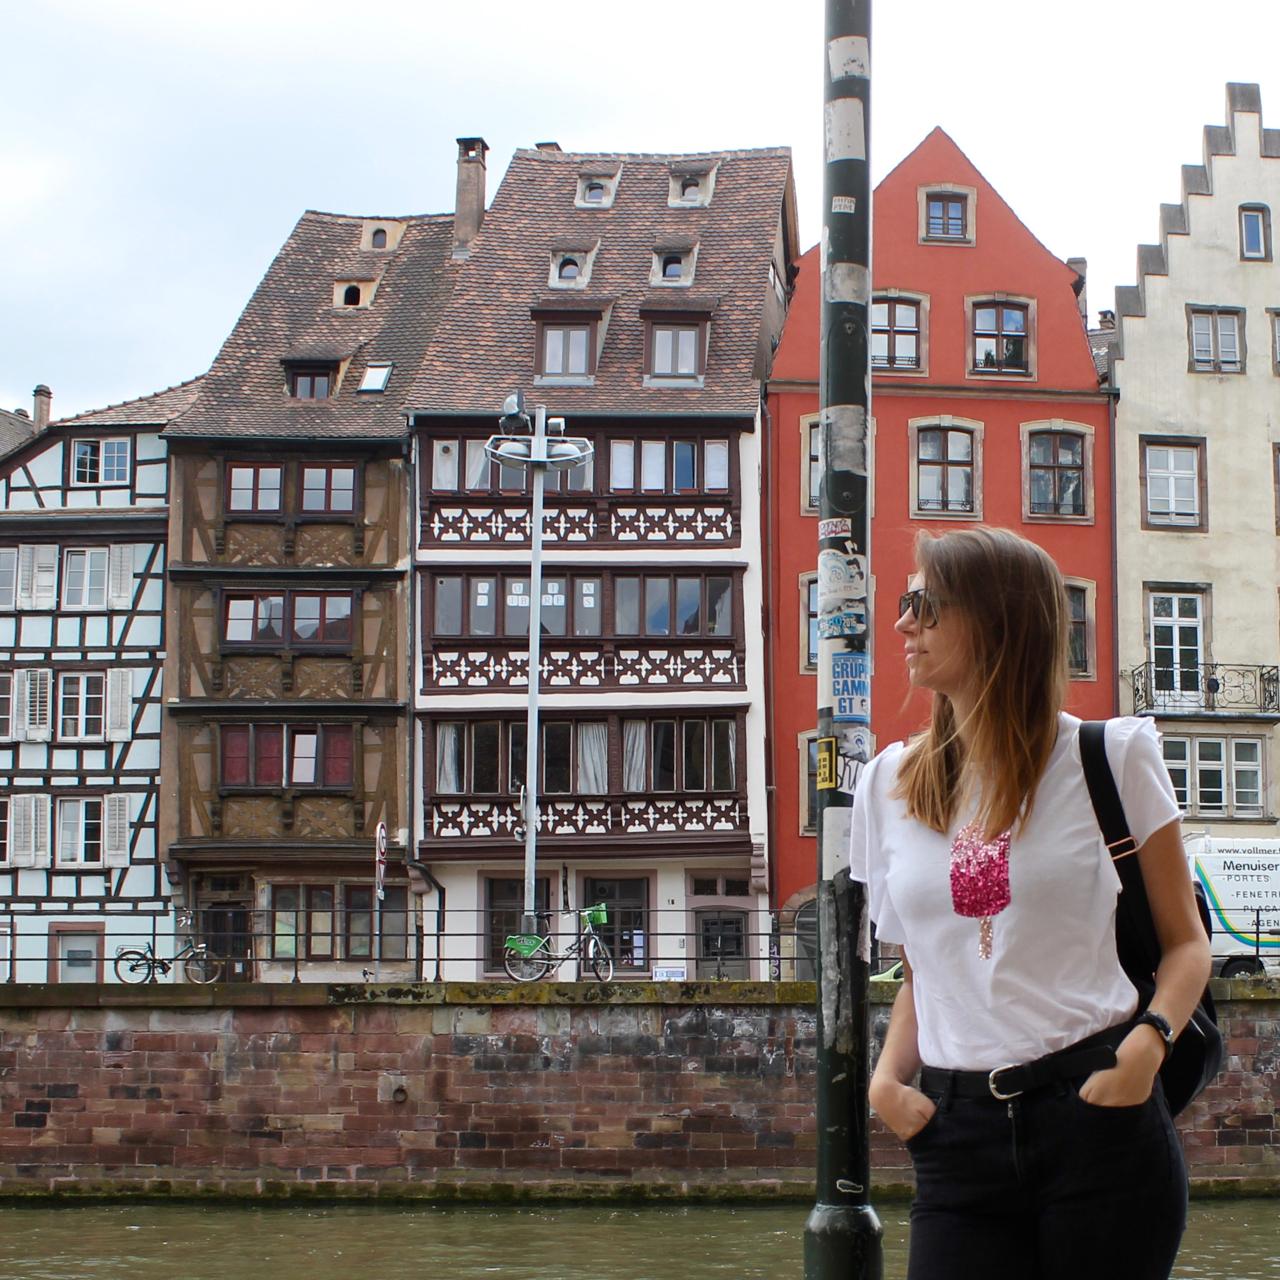 Strasbourg, France - 13